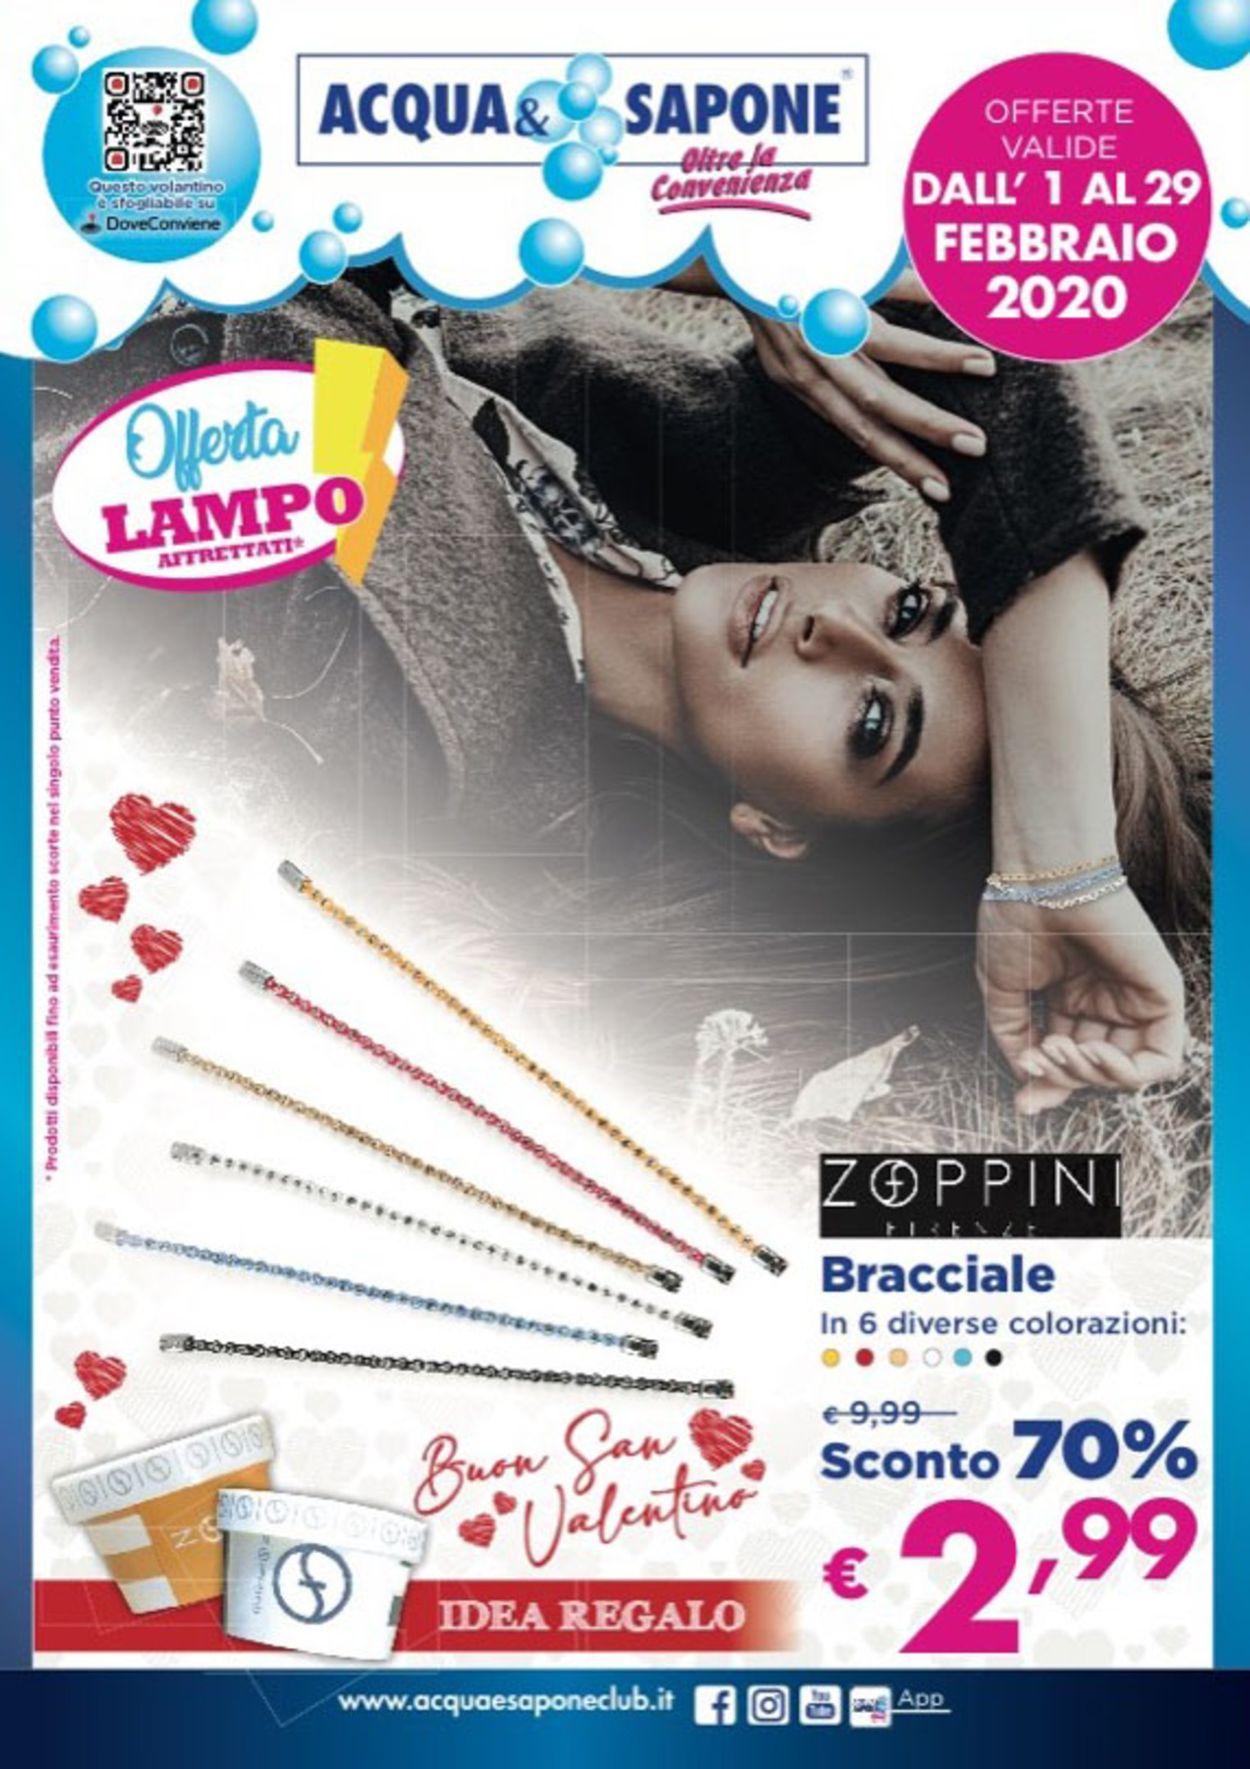 Volantino Acqua & Sapone - Offerte 01/02-29/02/2020